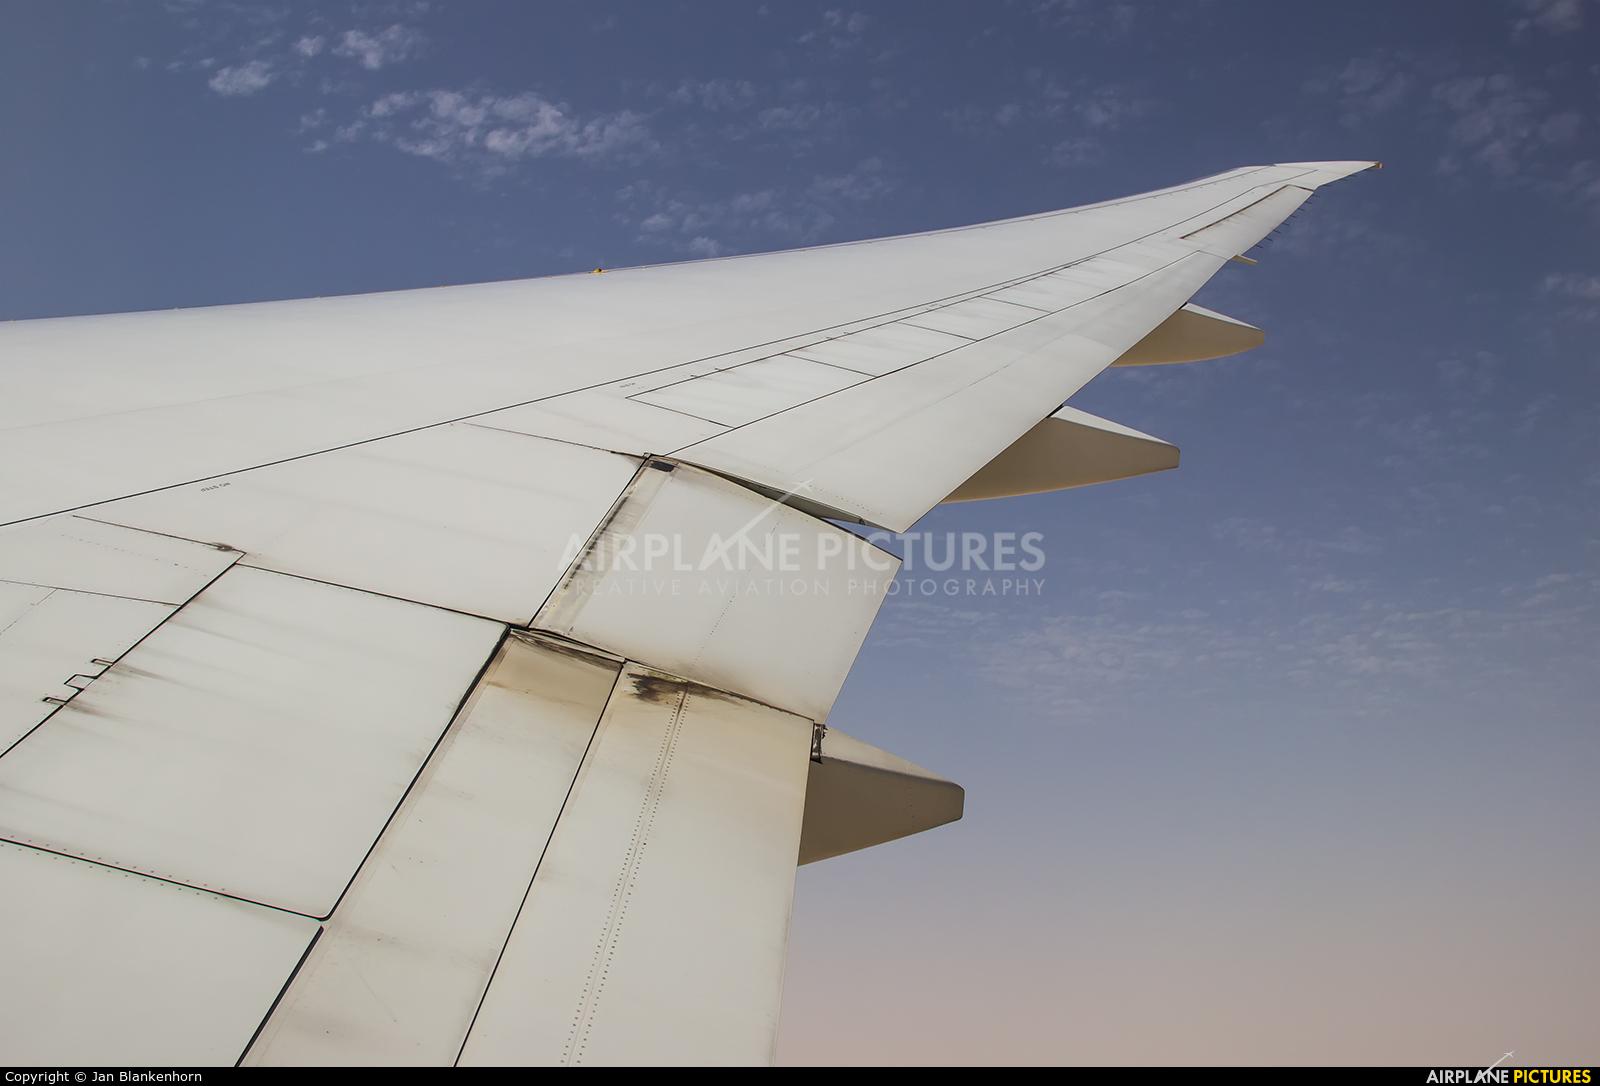 Etihad Airways A6-ETF aircraft at In Flight - UAE